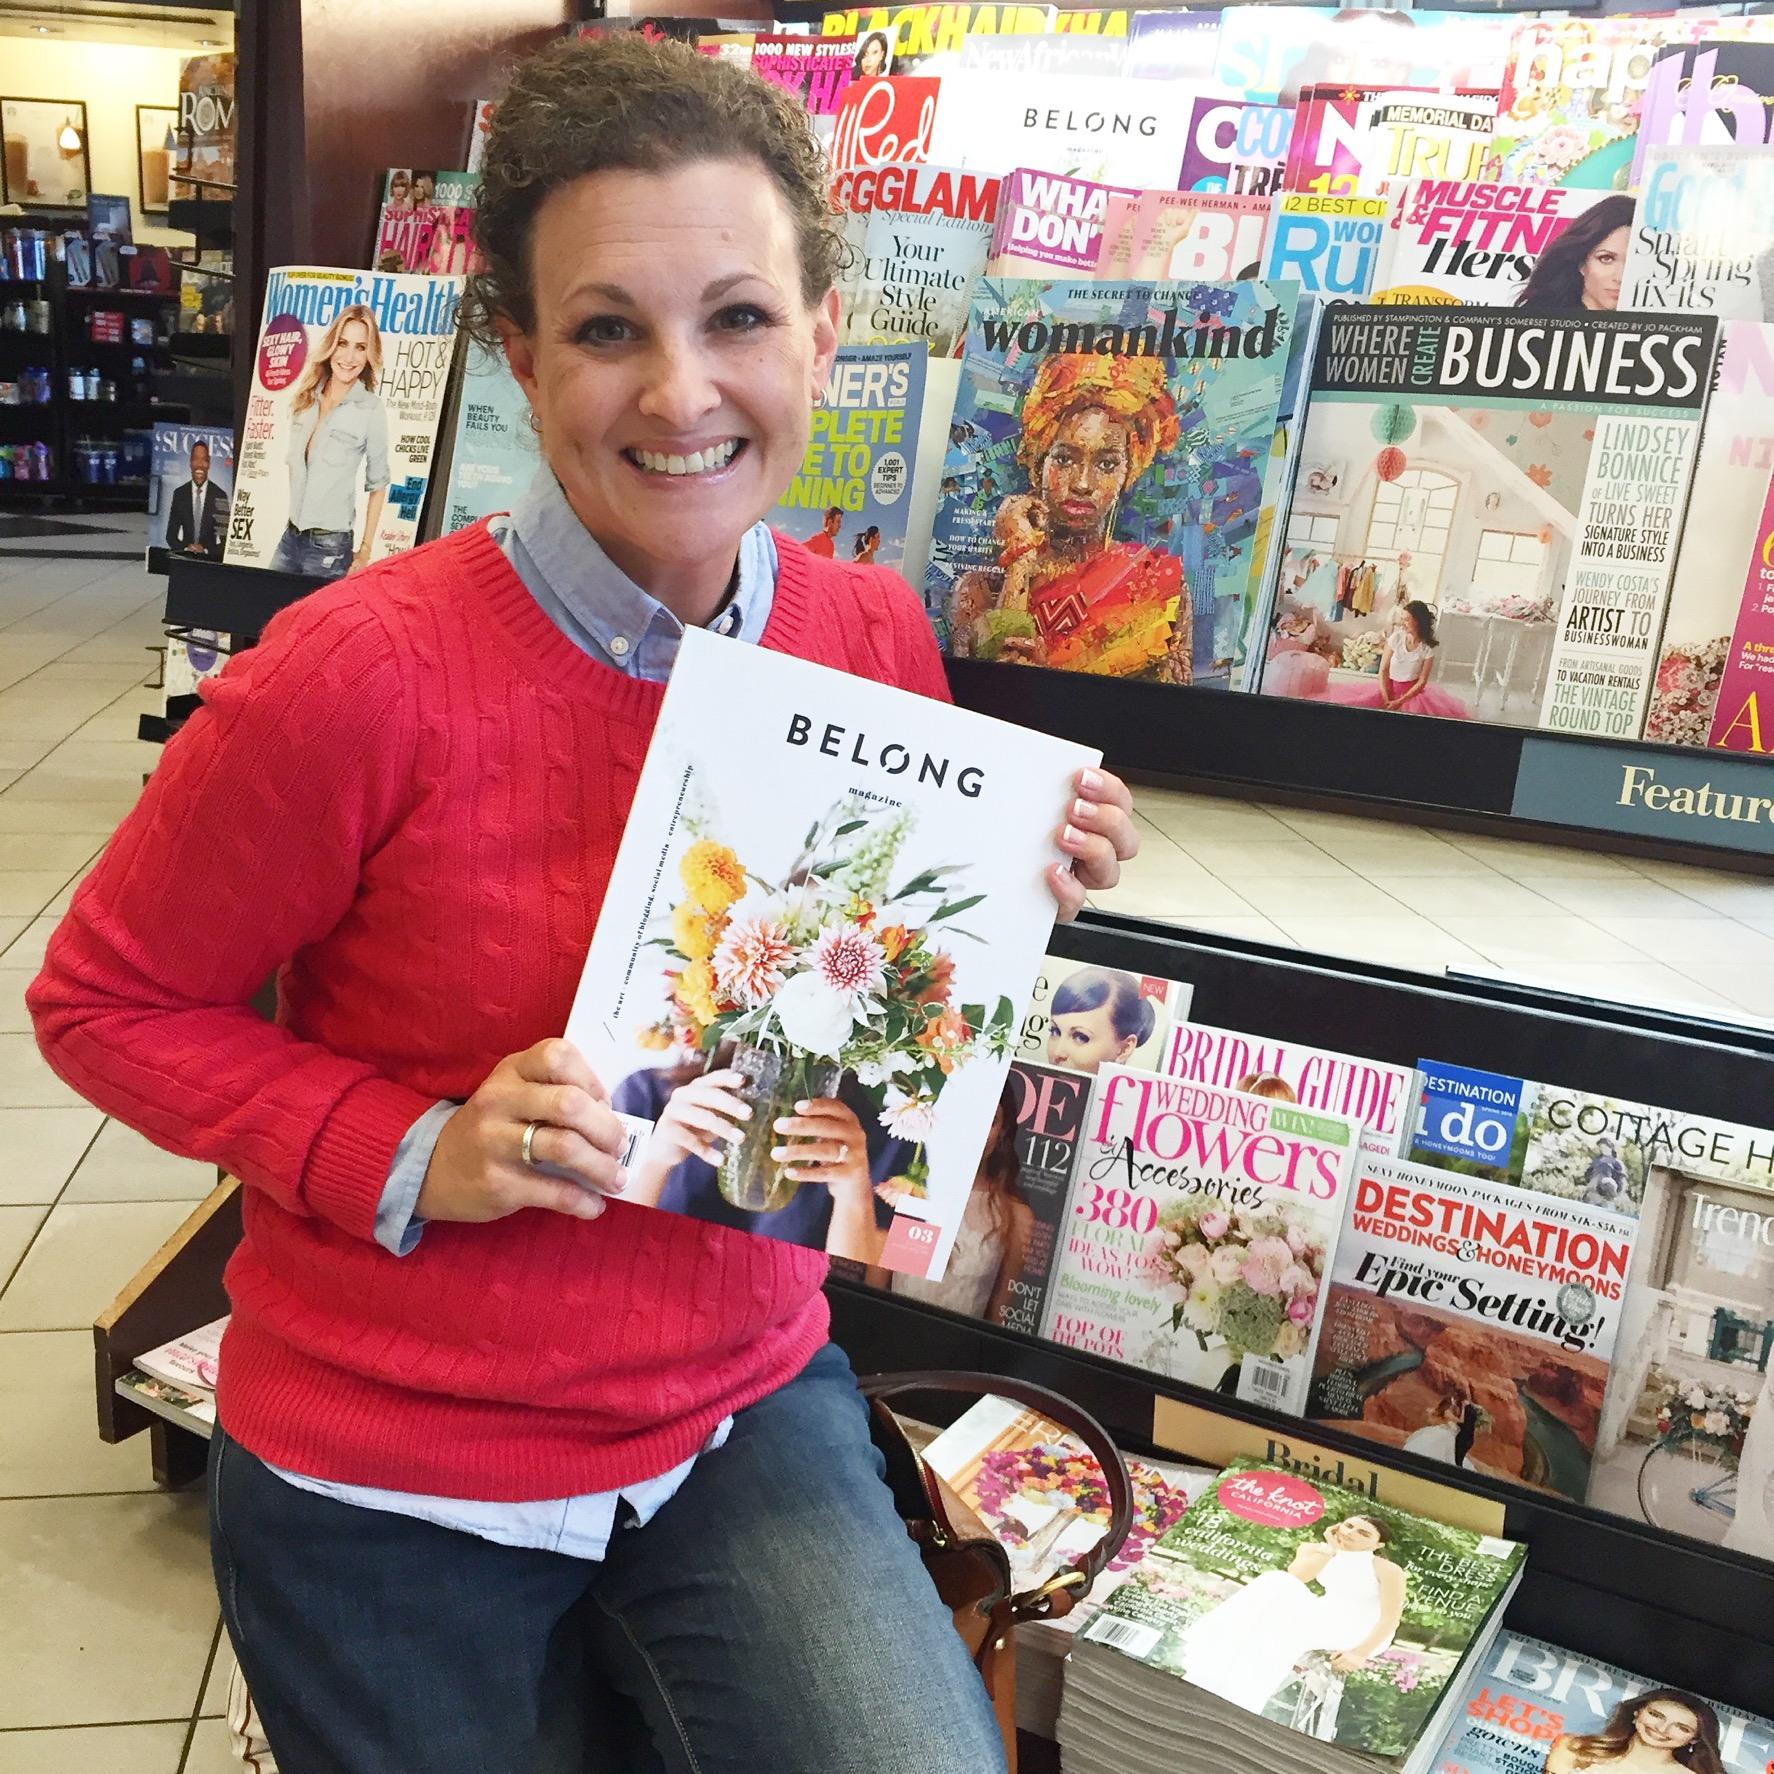 Brooke Saxon-Spencer and Belong Magazine at Barnes and Noble